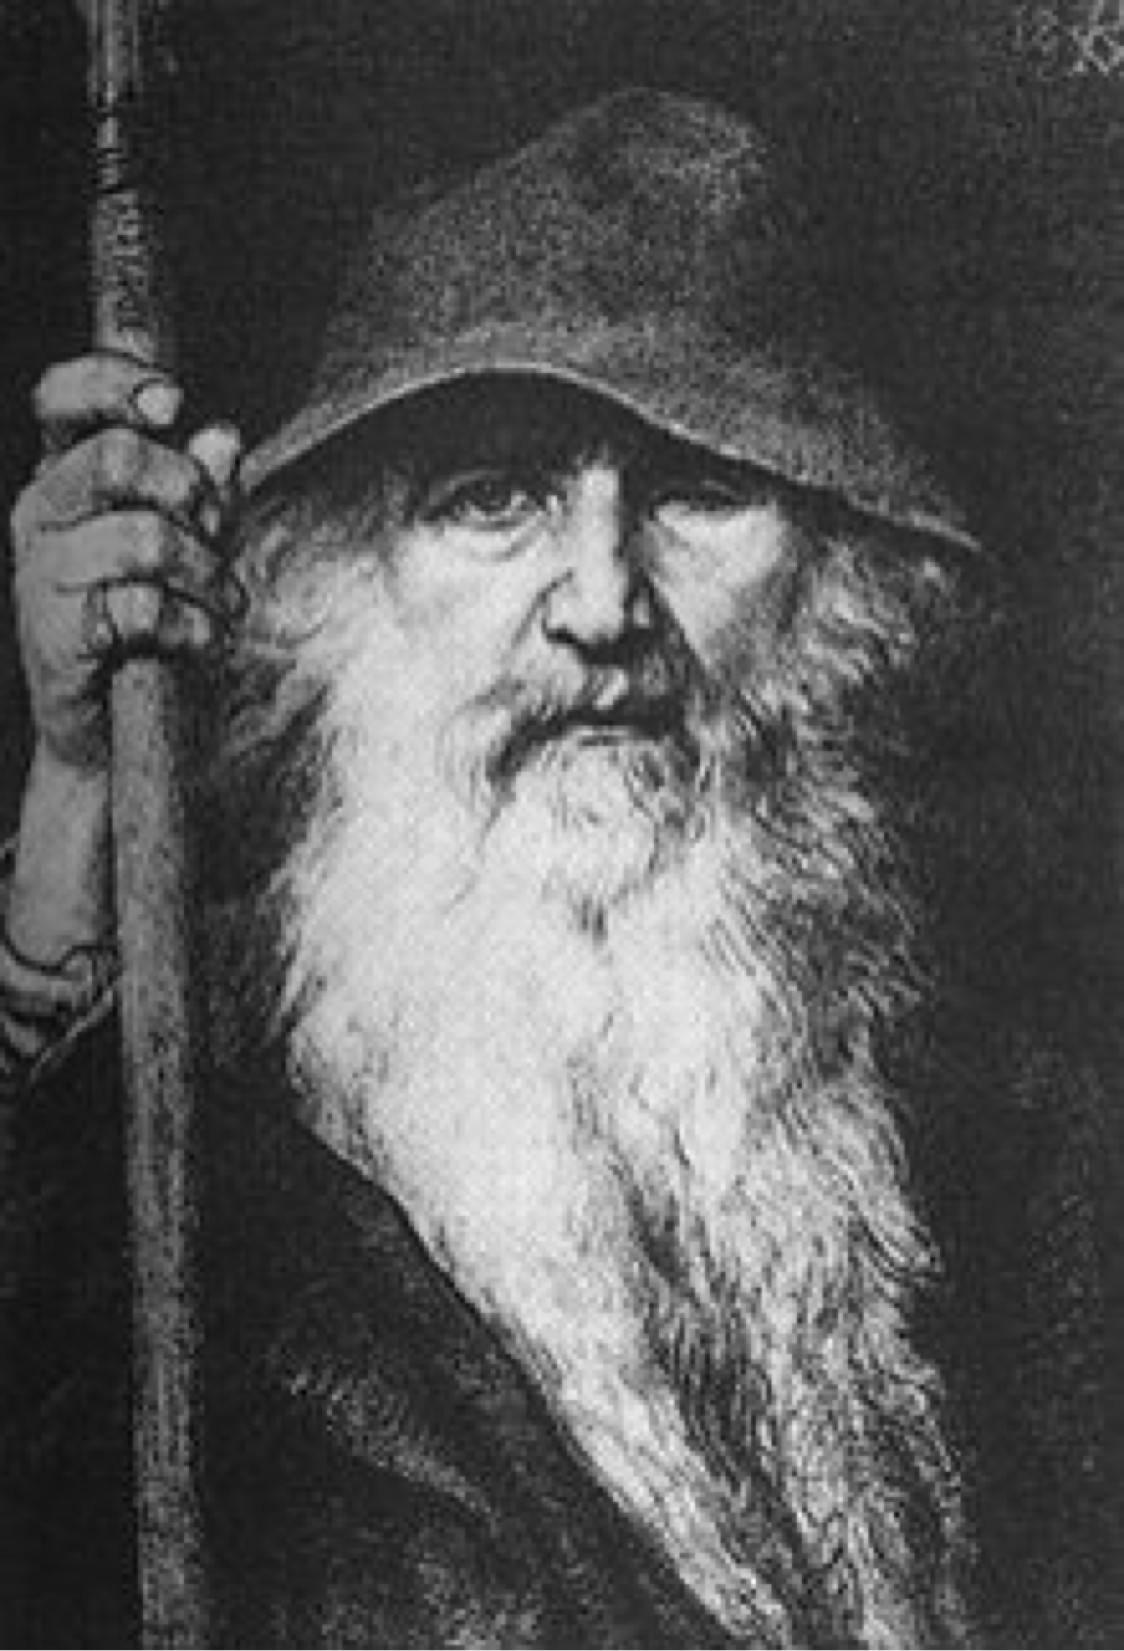 Portrait Of Germanic God Odin